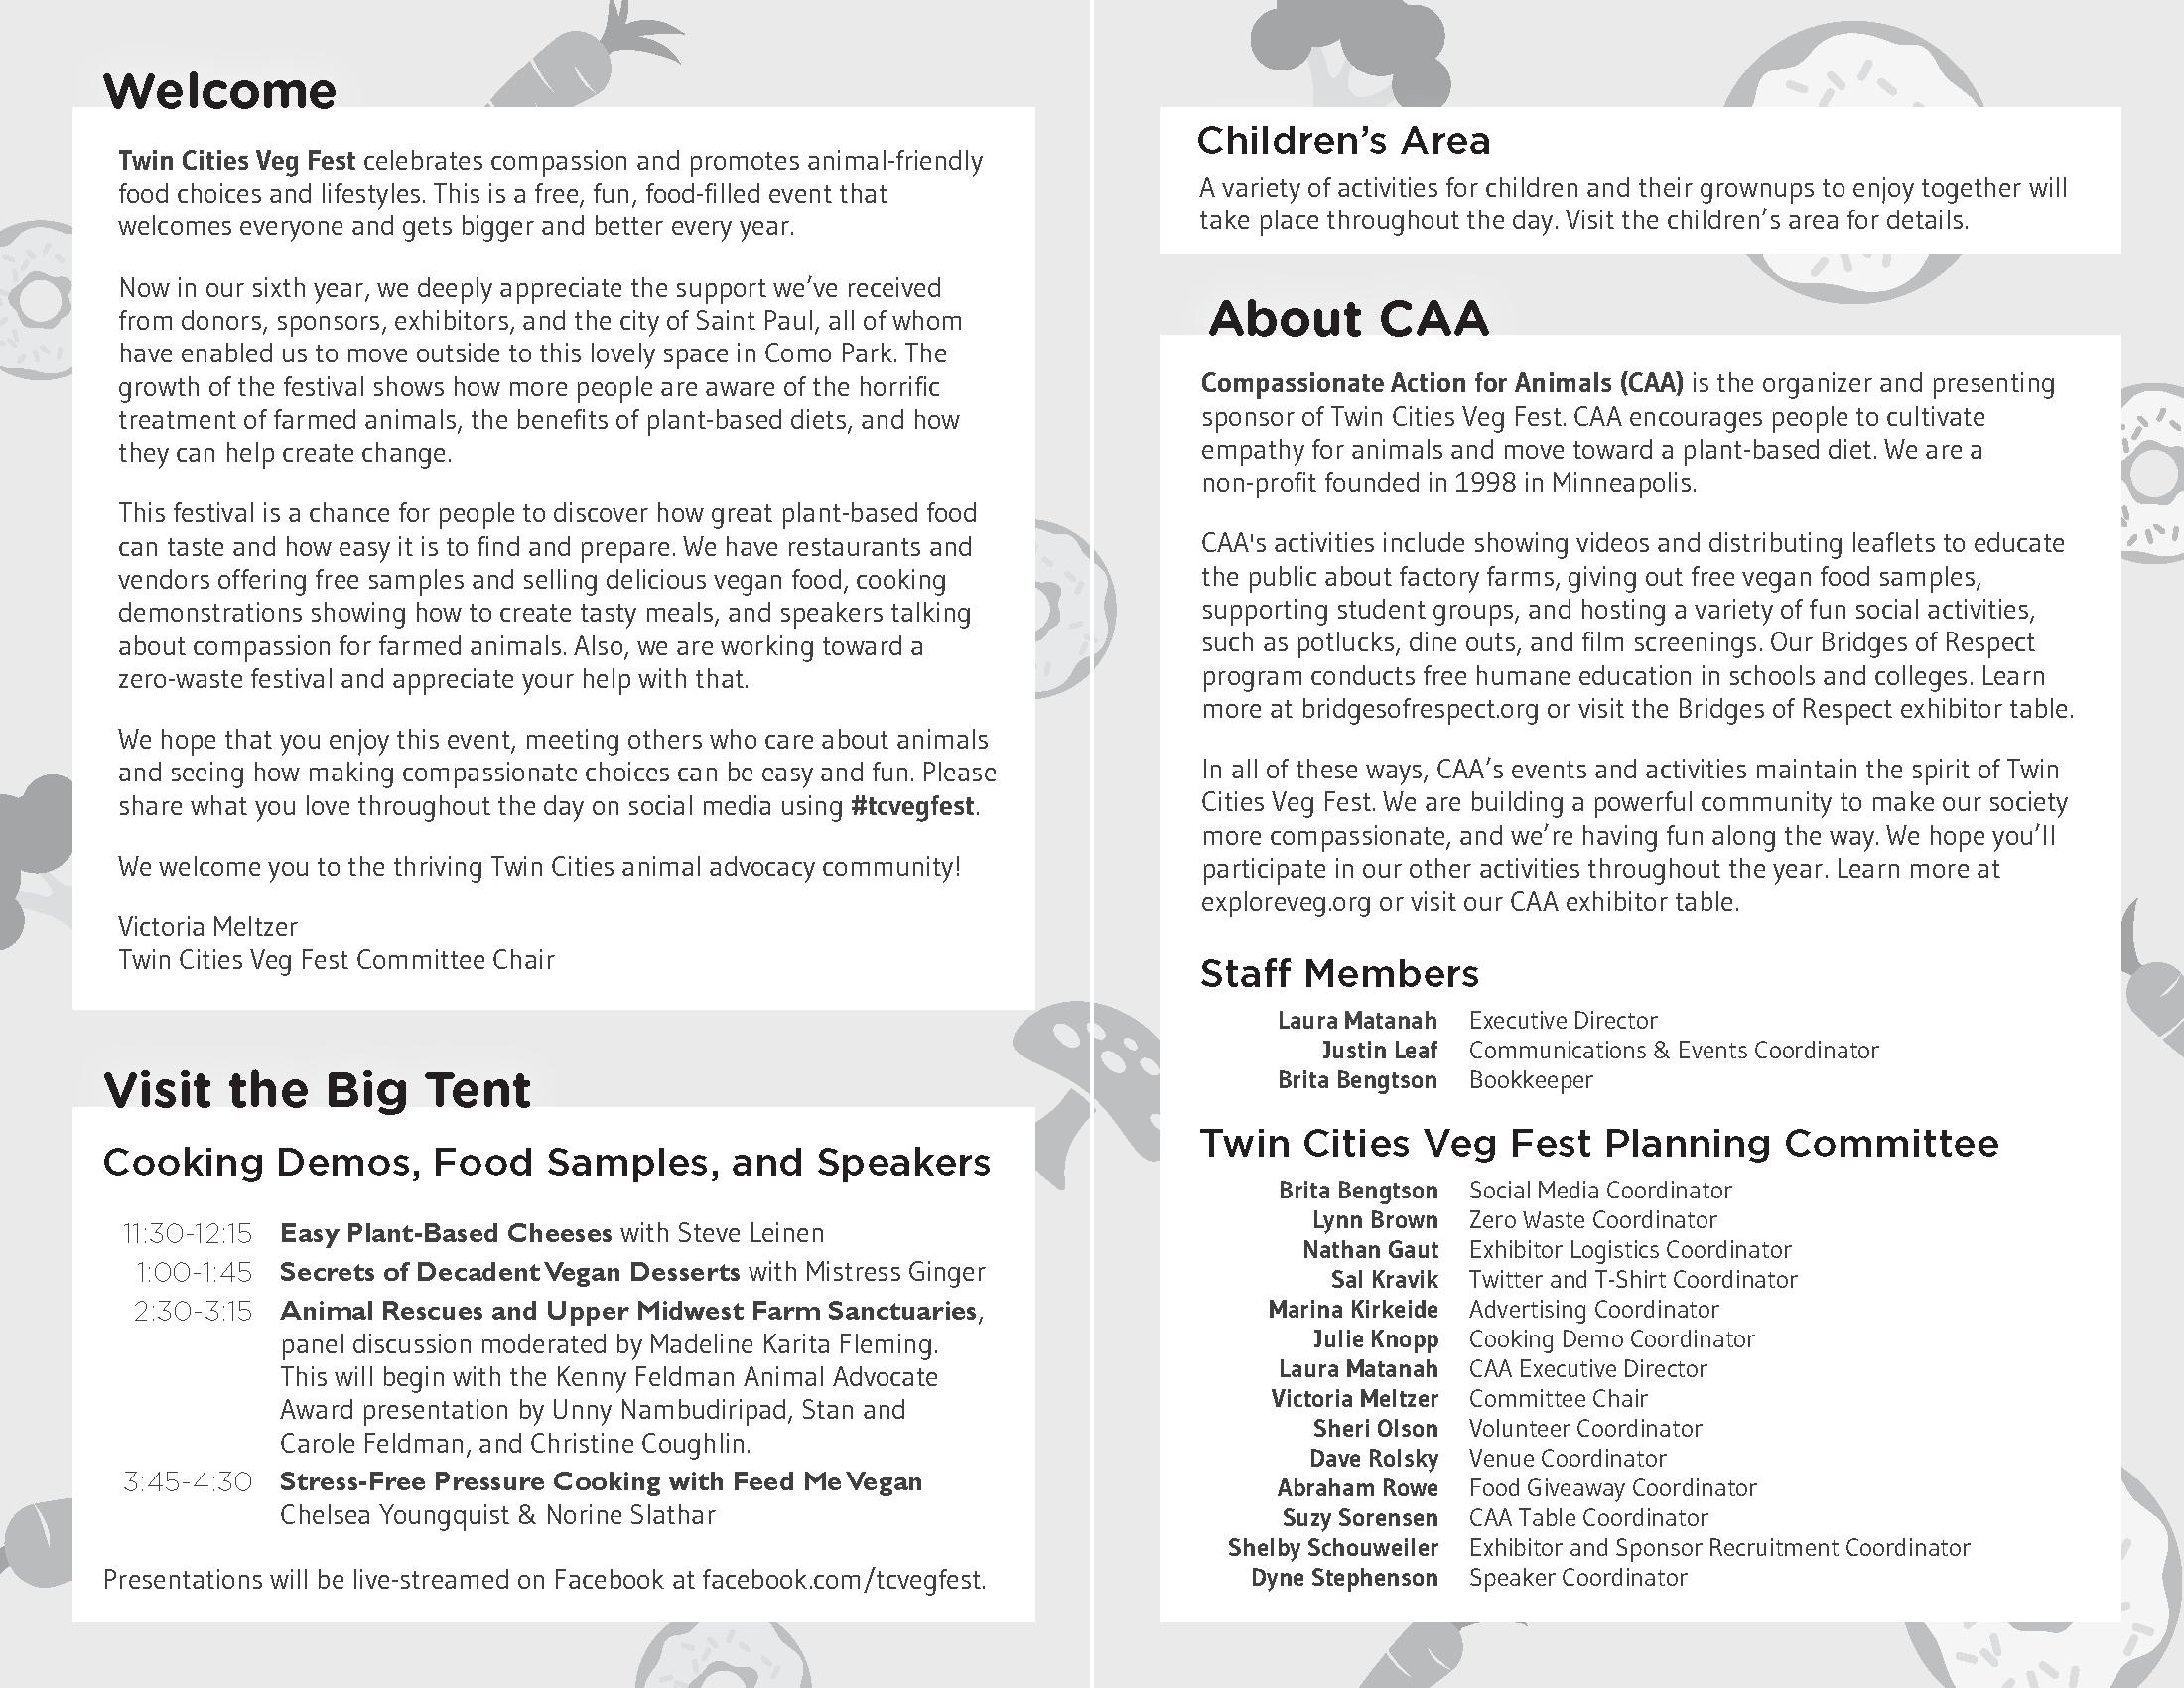 Insides of an informational program.